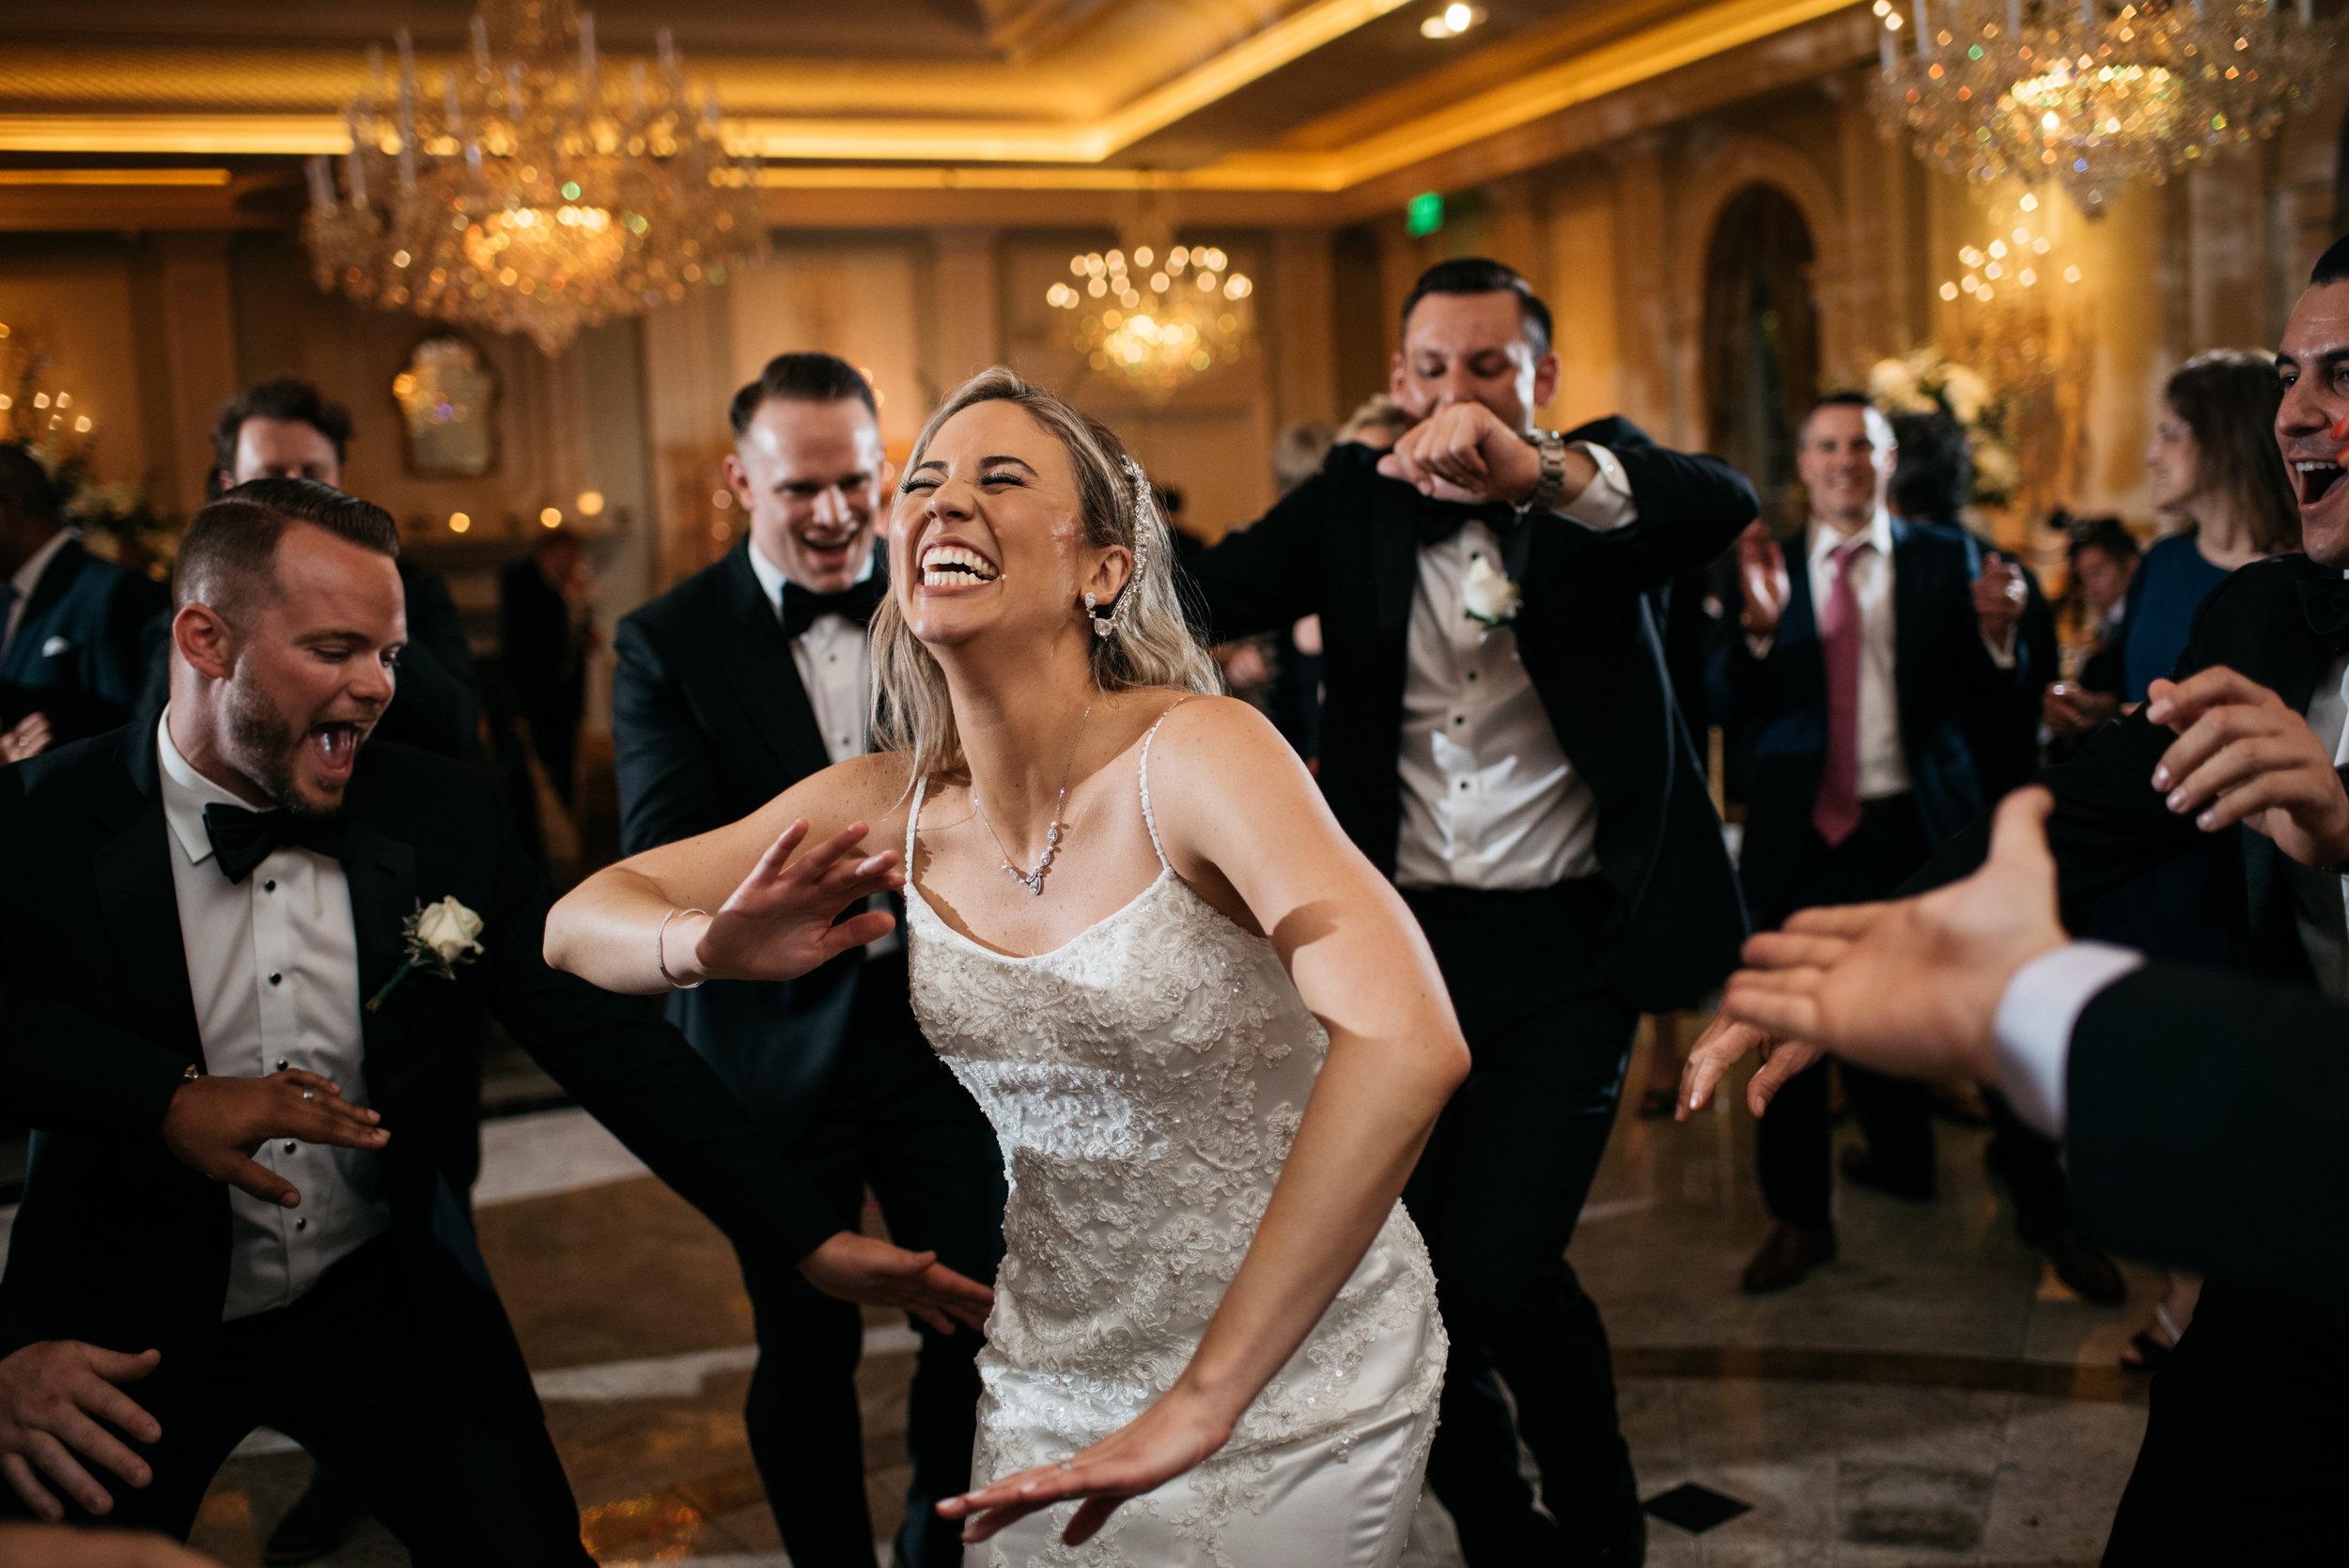 WeddingPhotos | NJPhotographer | Highlights-10.jpg